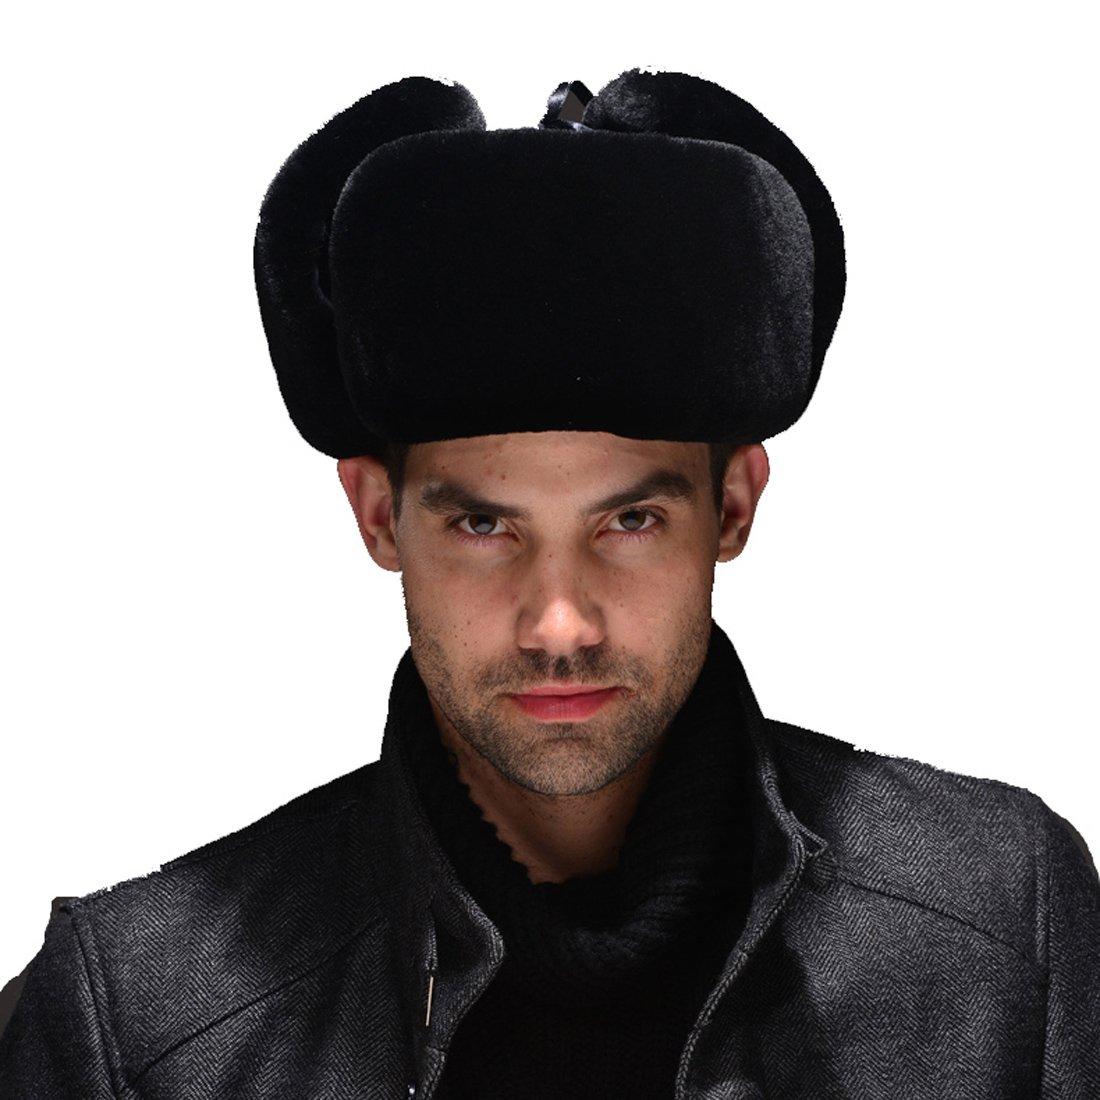 URSFUR Mouton Sheepskin & Leather Russian Ushanka Hat (One Size, Black) by URSFUR